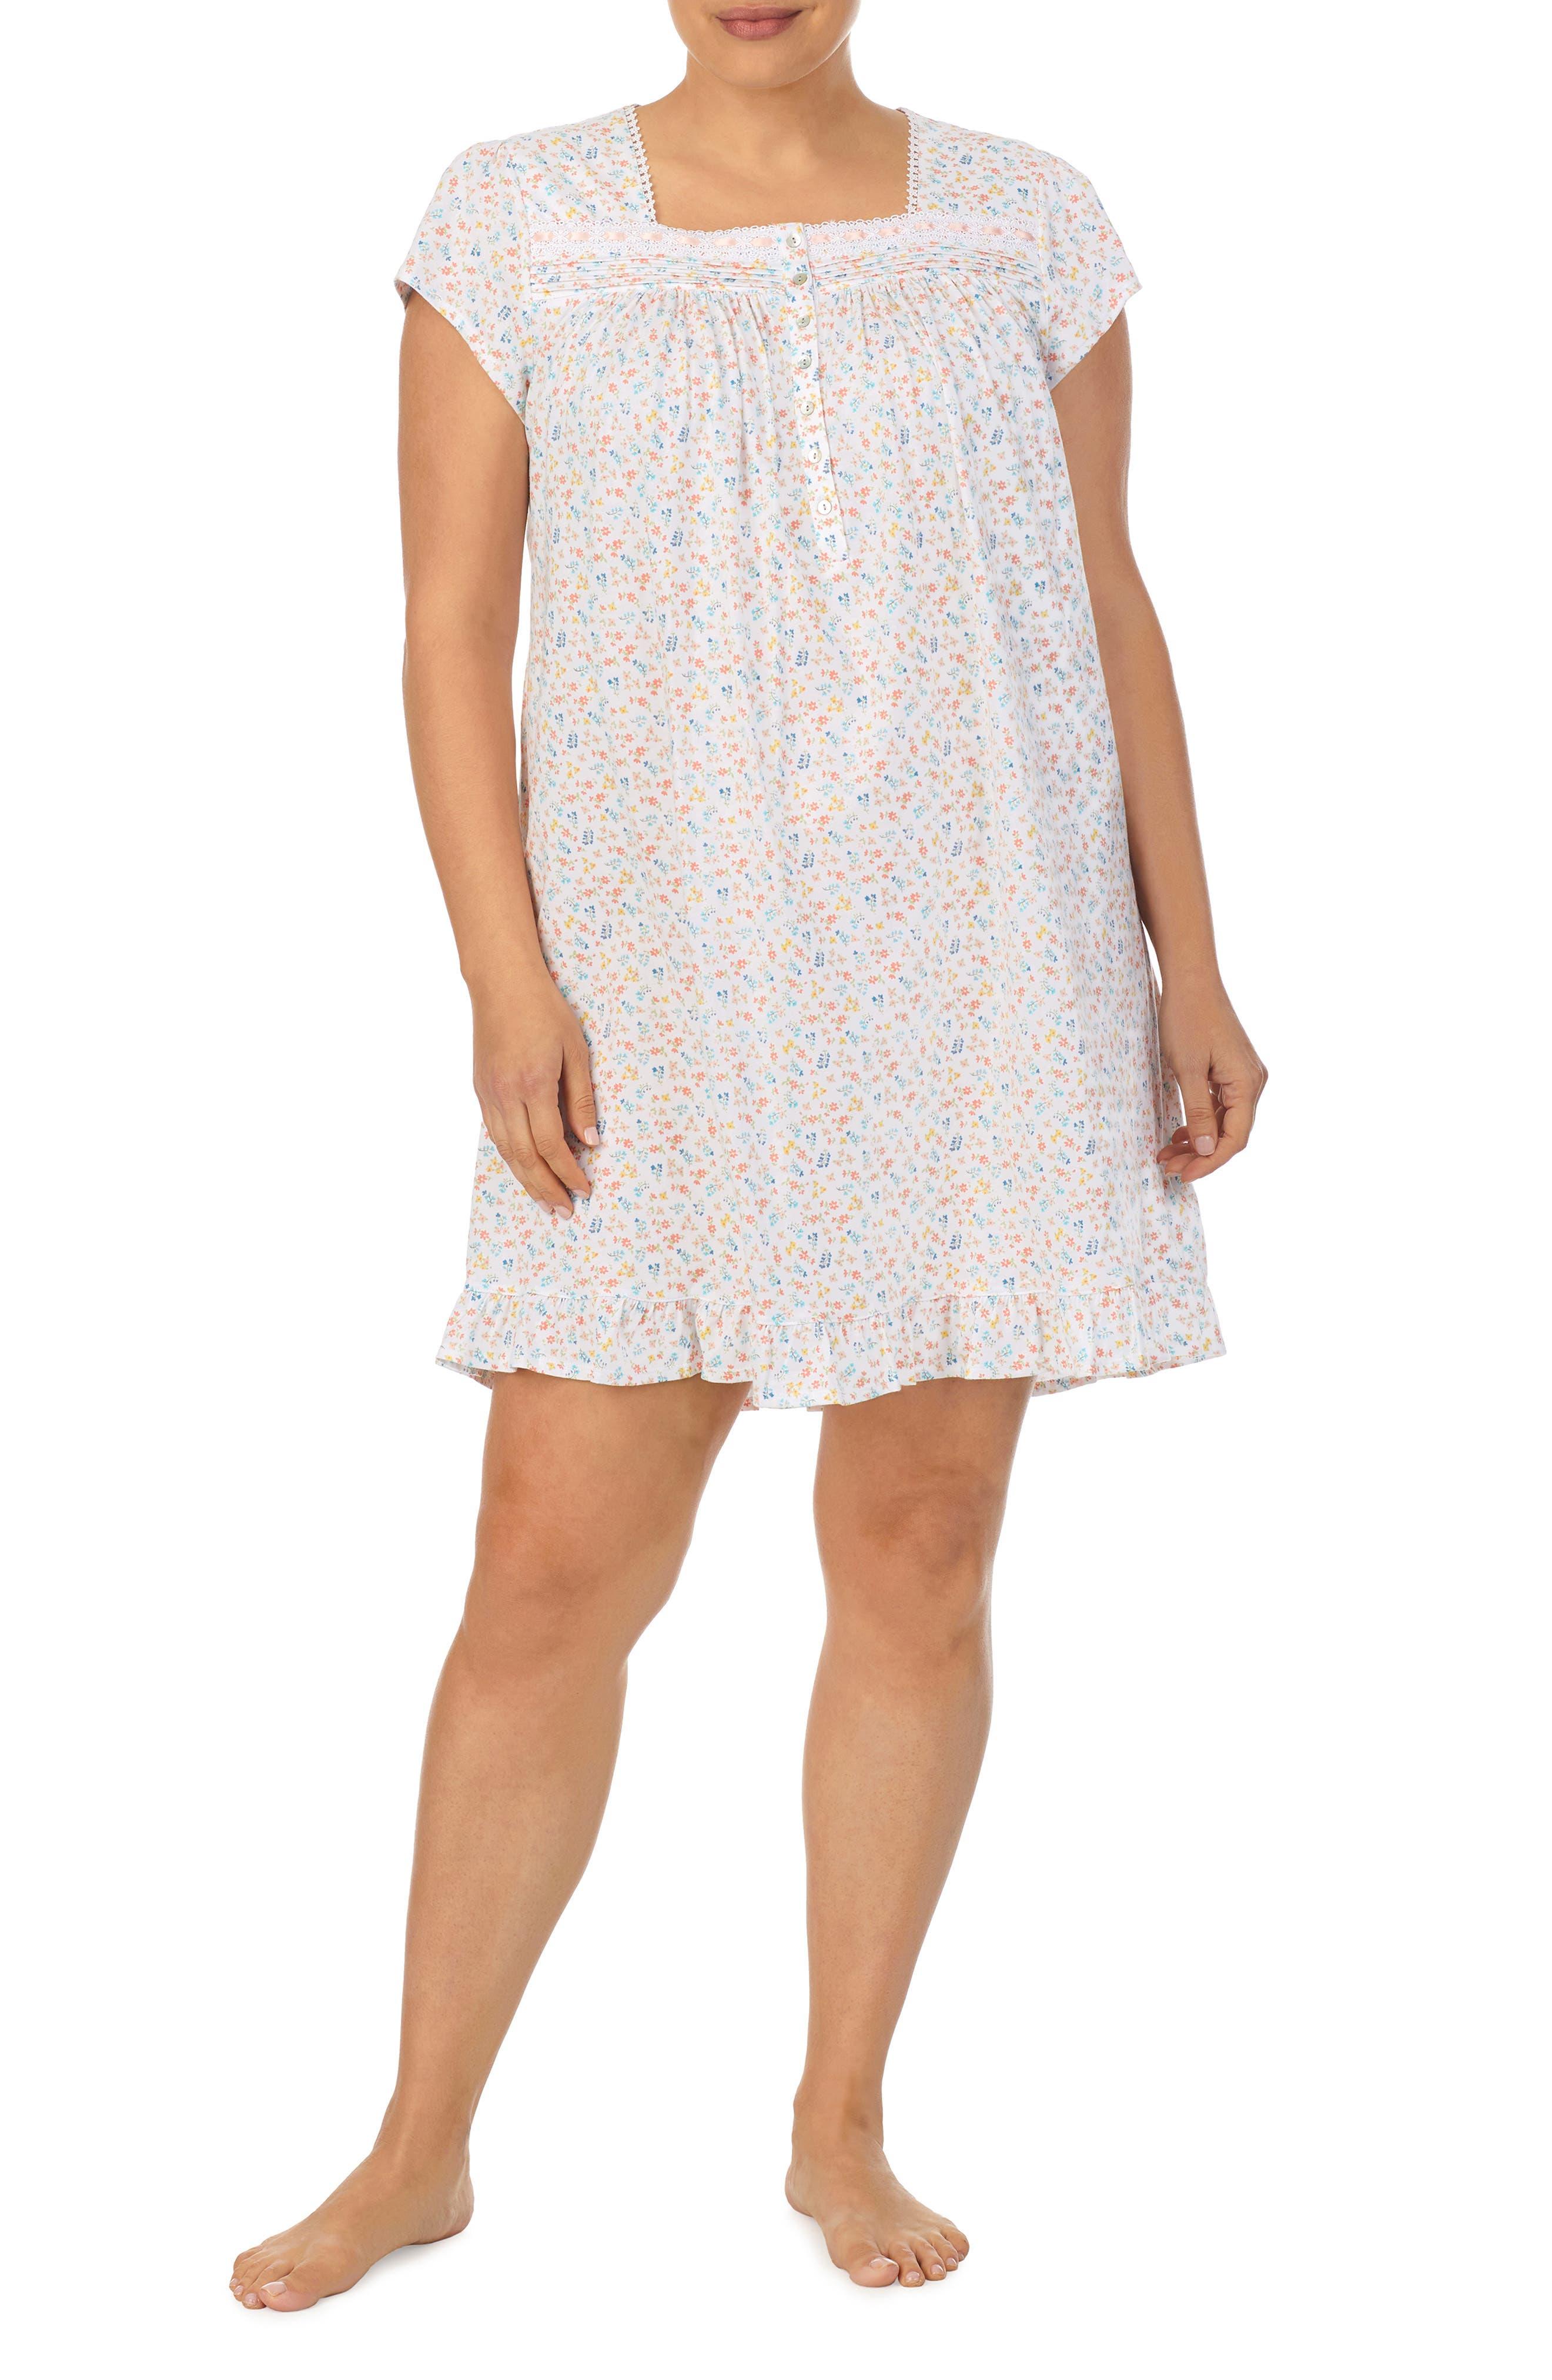 Short Cap Sleeve Cotton Nightgown